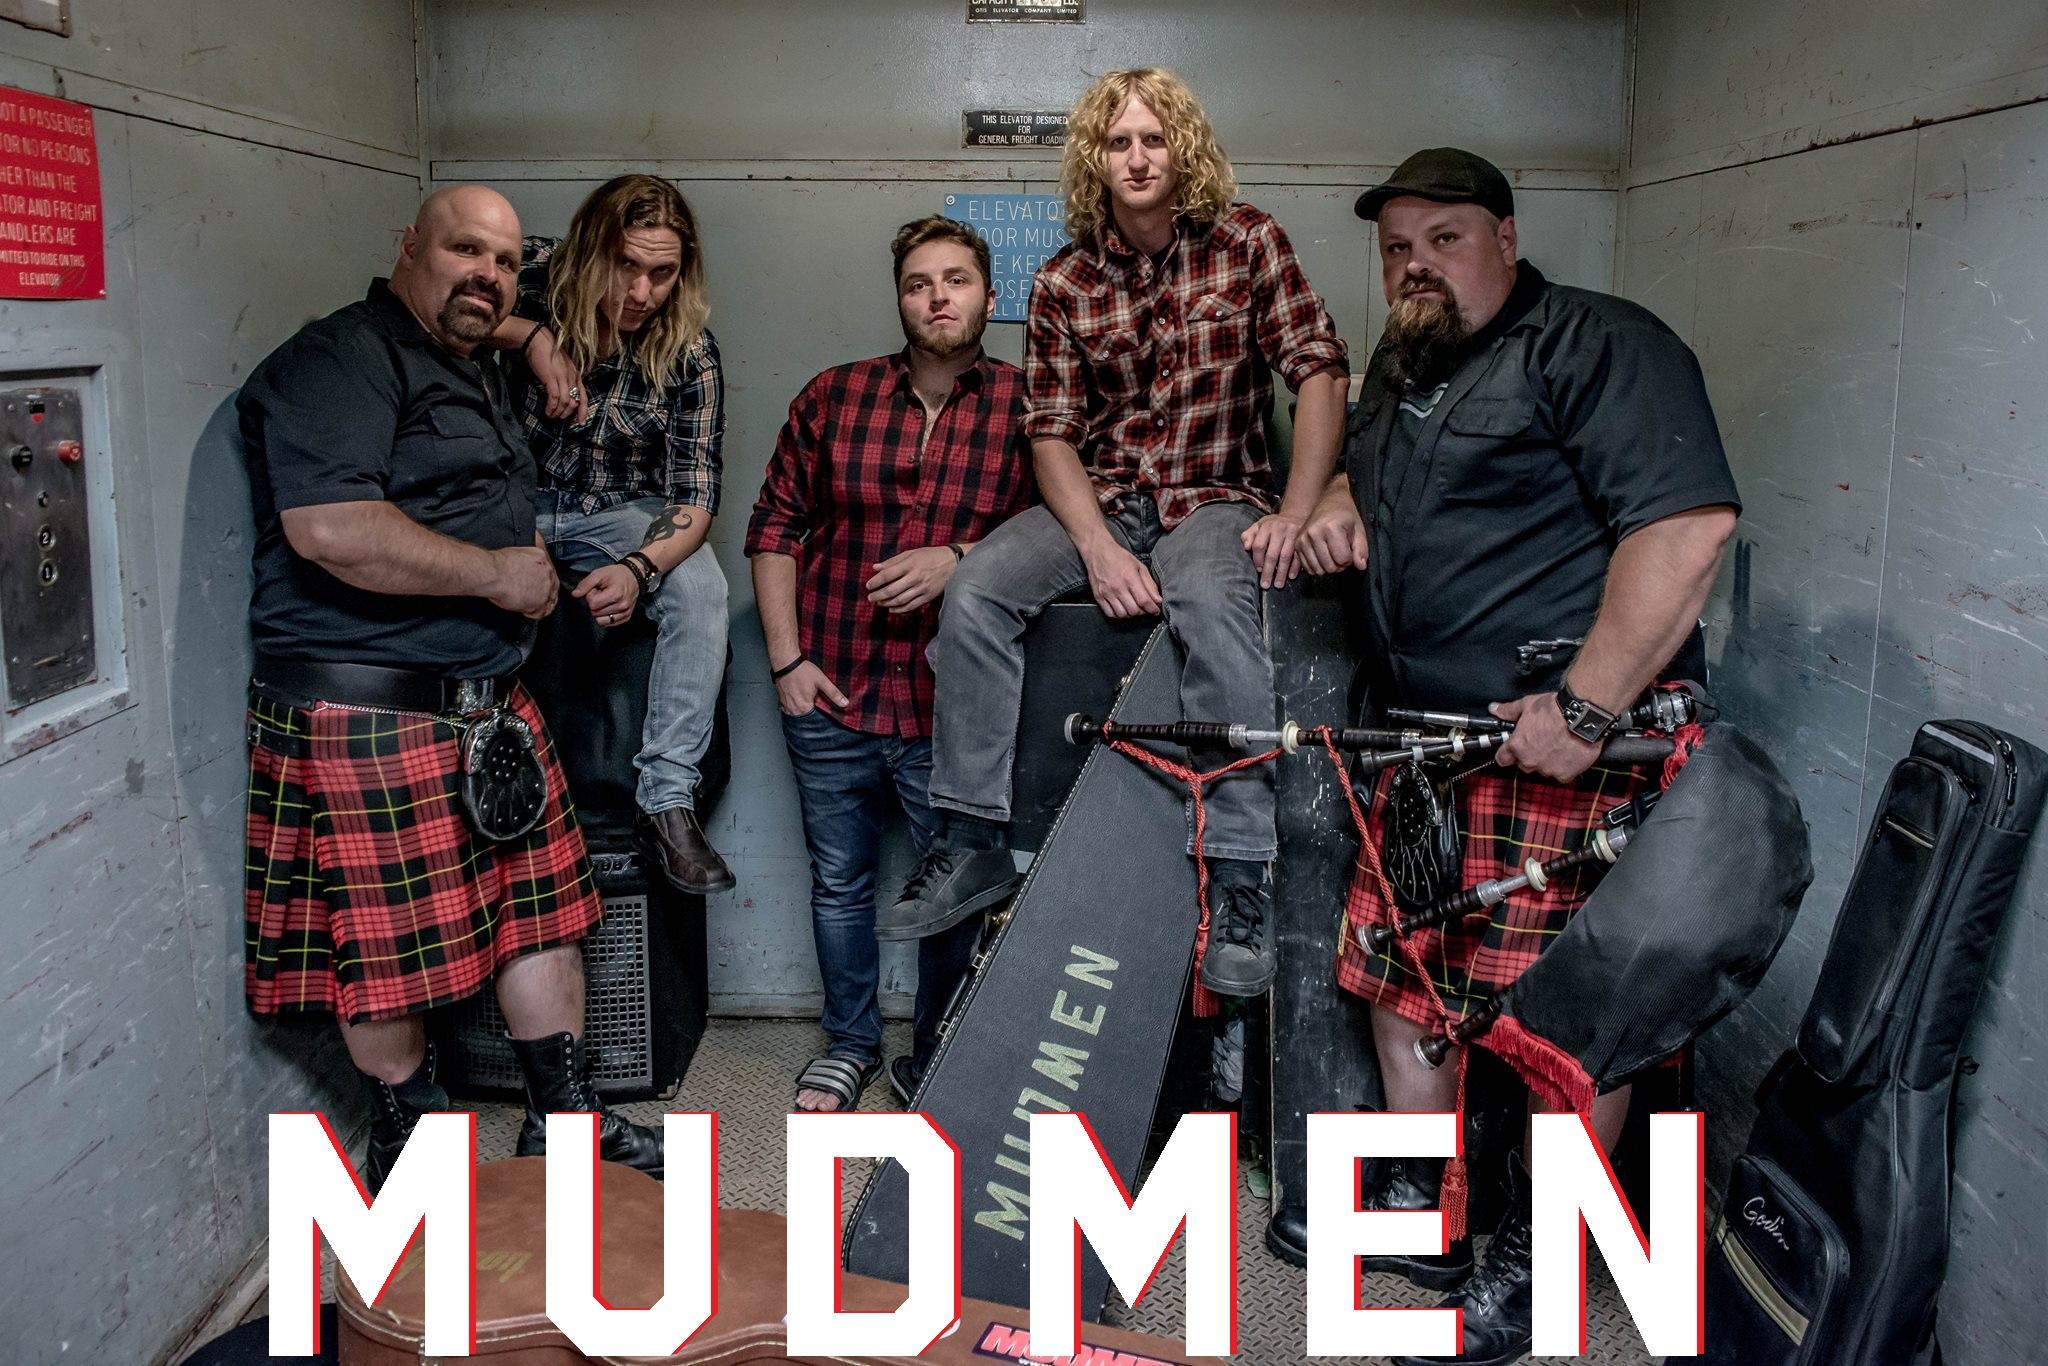 Mudmen - The Celtic Warriors